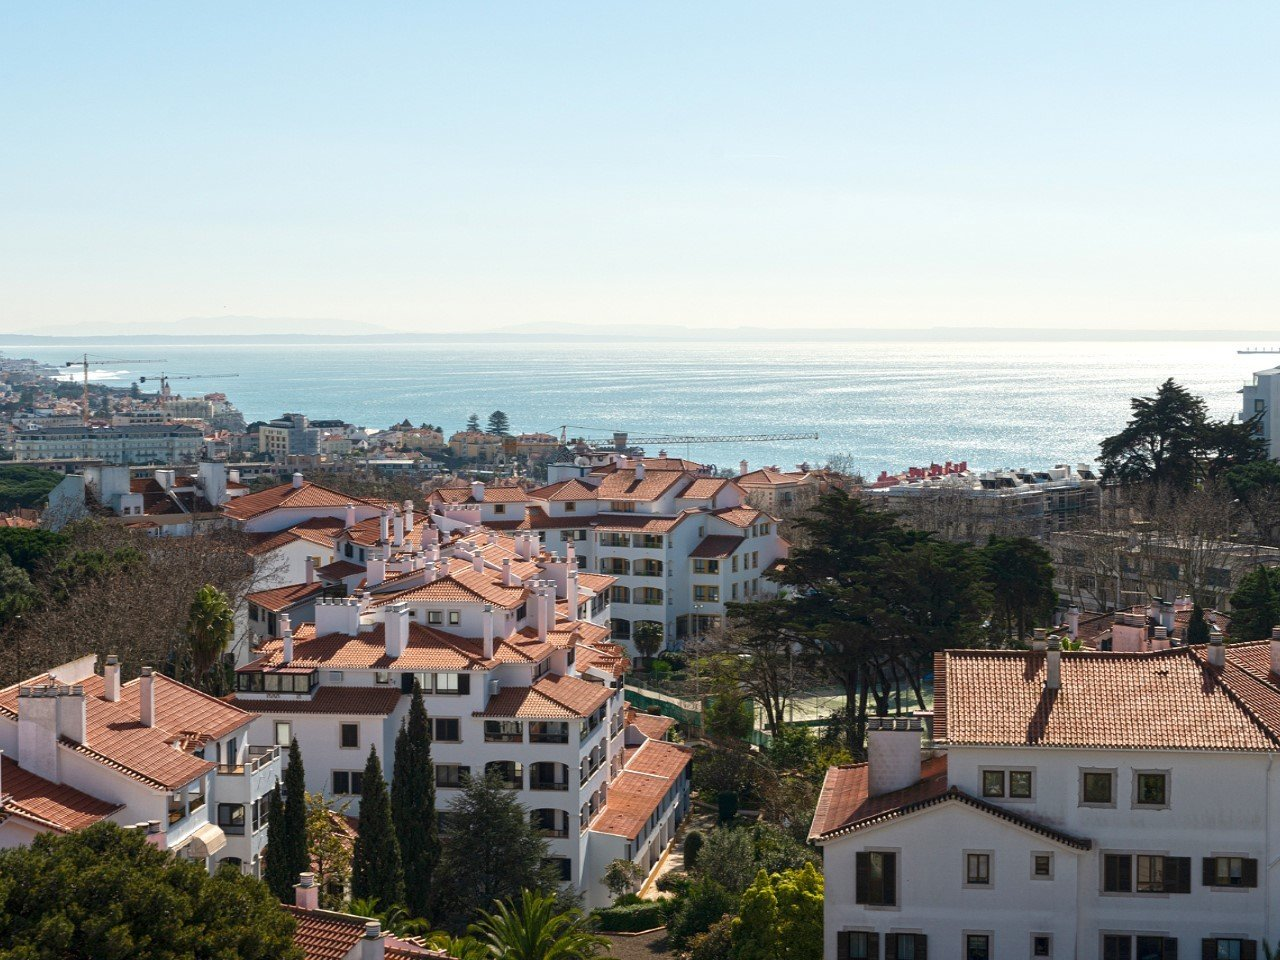 3 Bedroom Apartment Estoril, Lisbon Ref: AMA13887